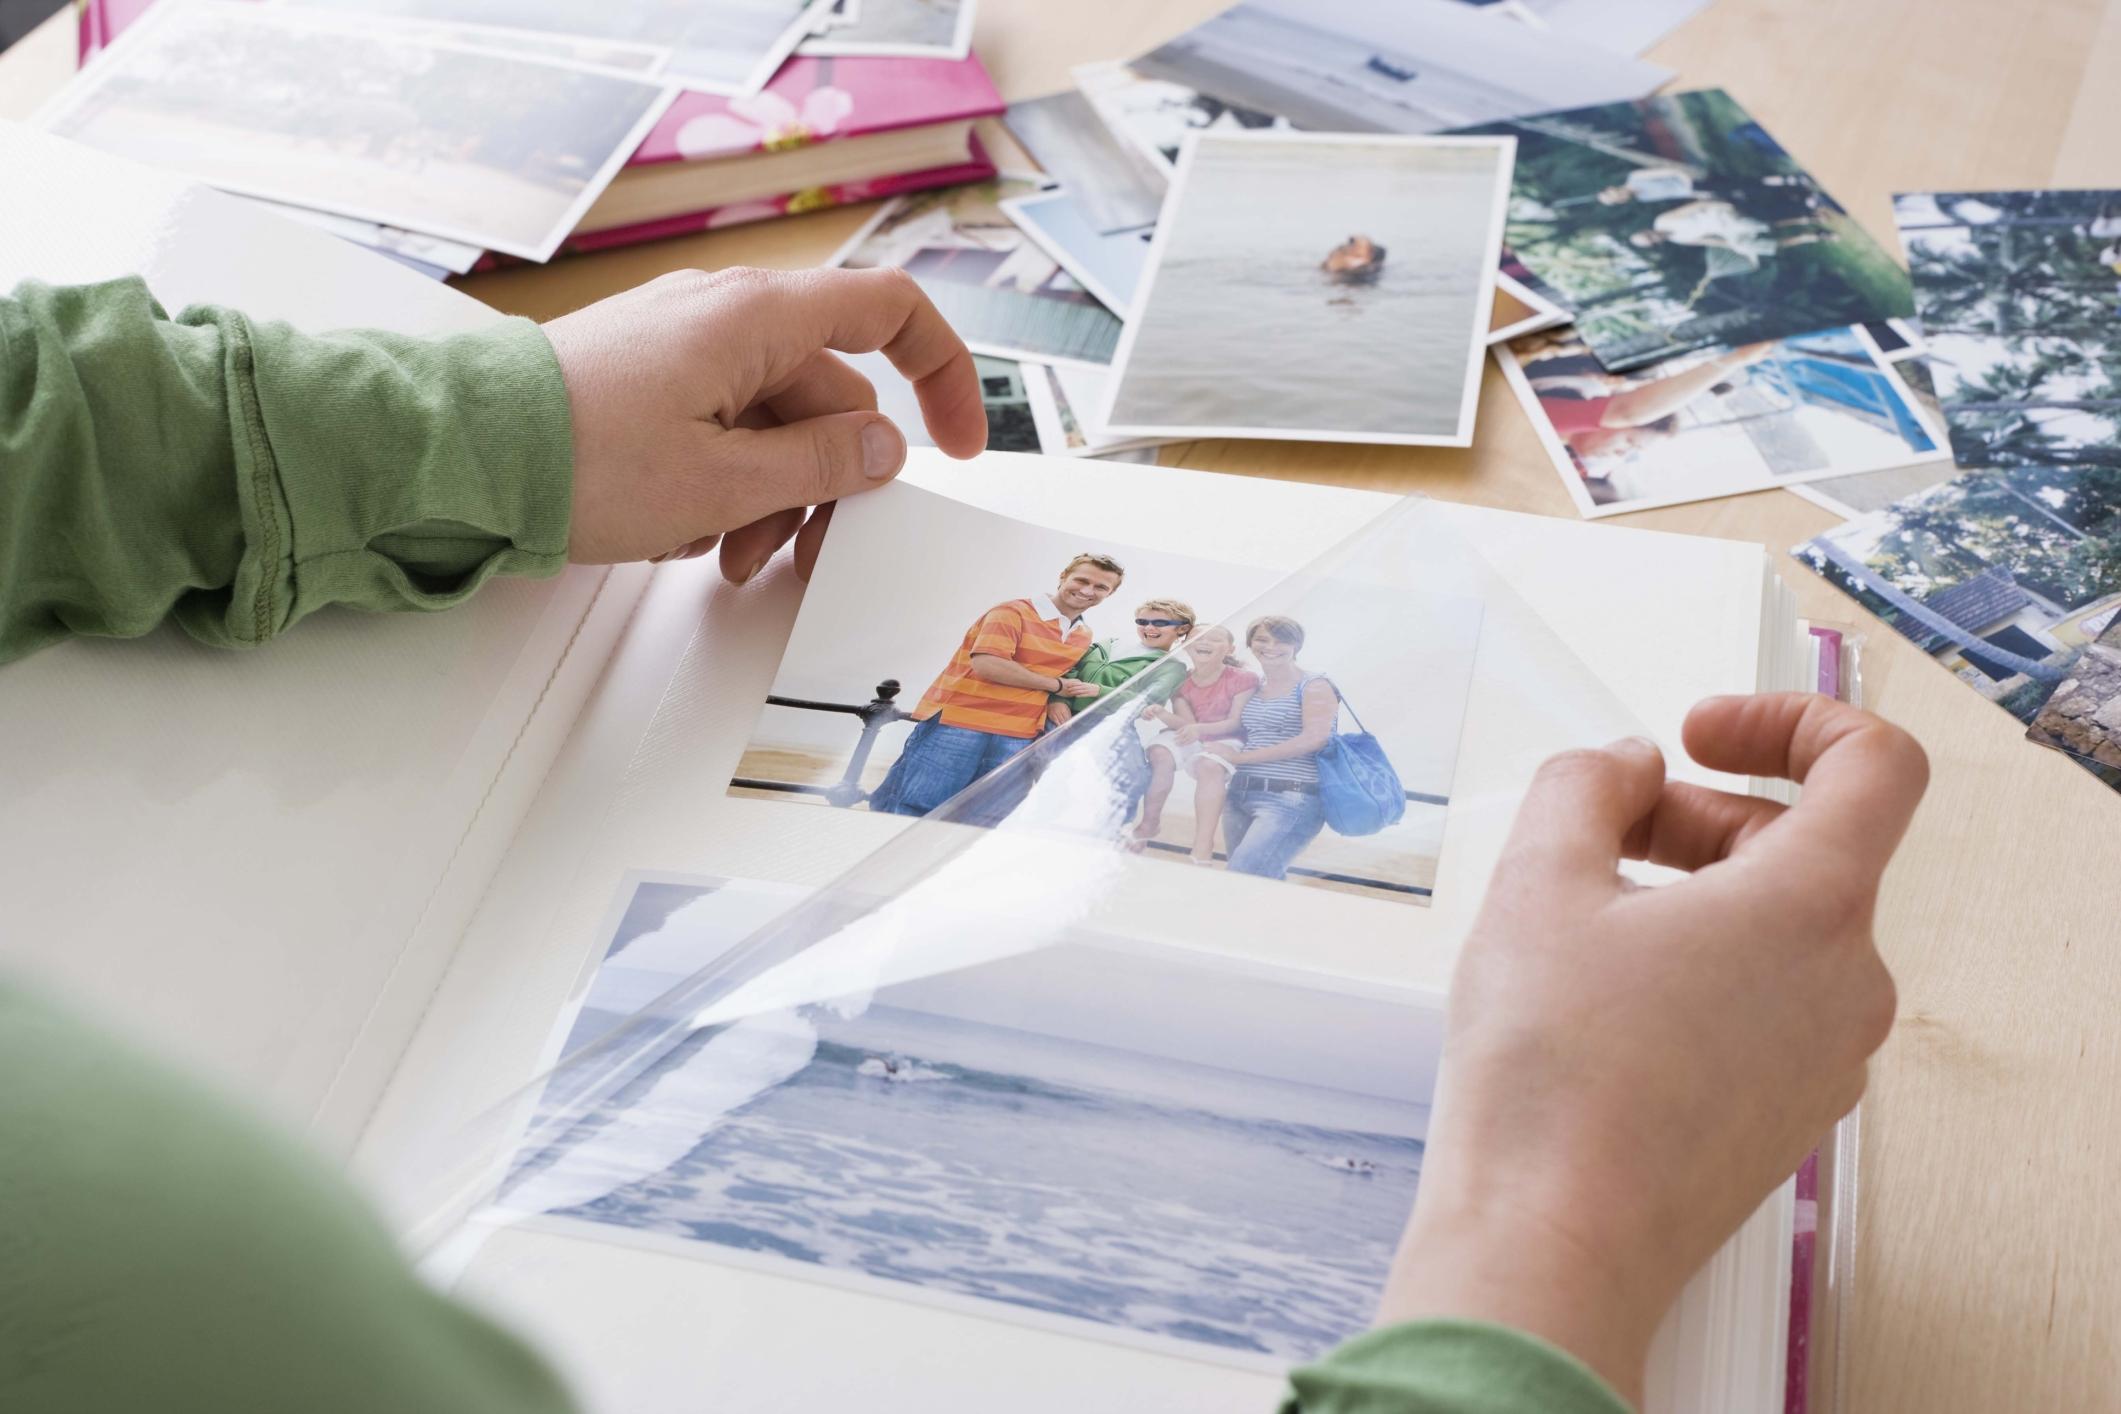 How to Reset a Canon Pixma Printer | Bizfluent